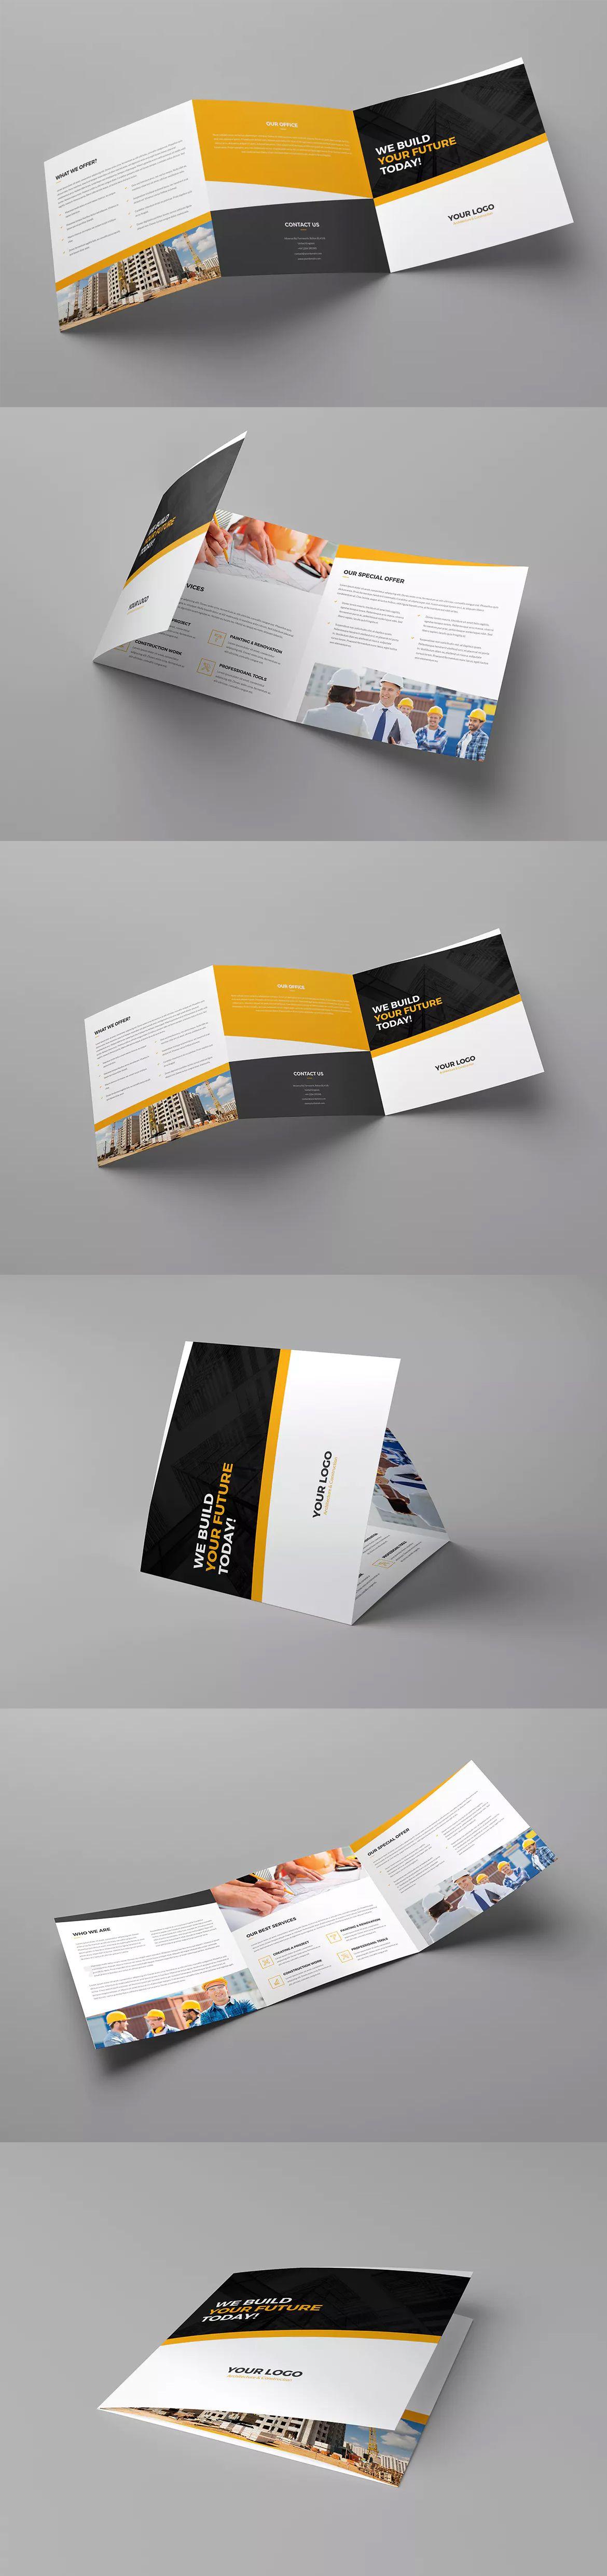 Architecture & Construction Tri Fold Brochure Template PSD